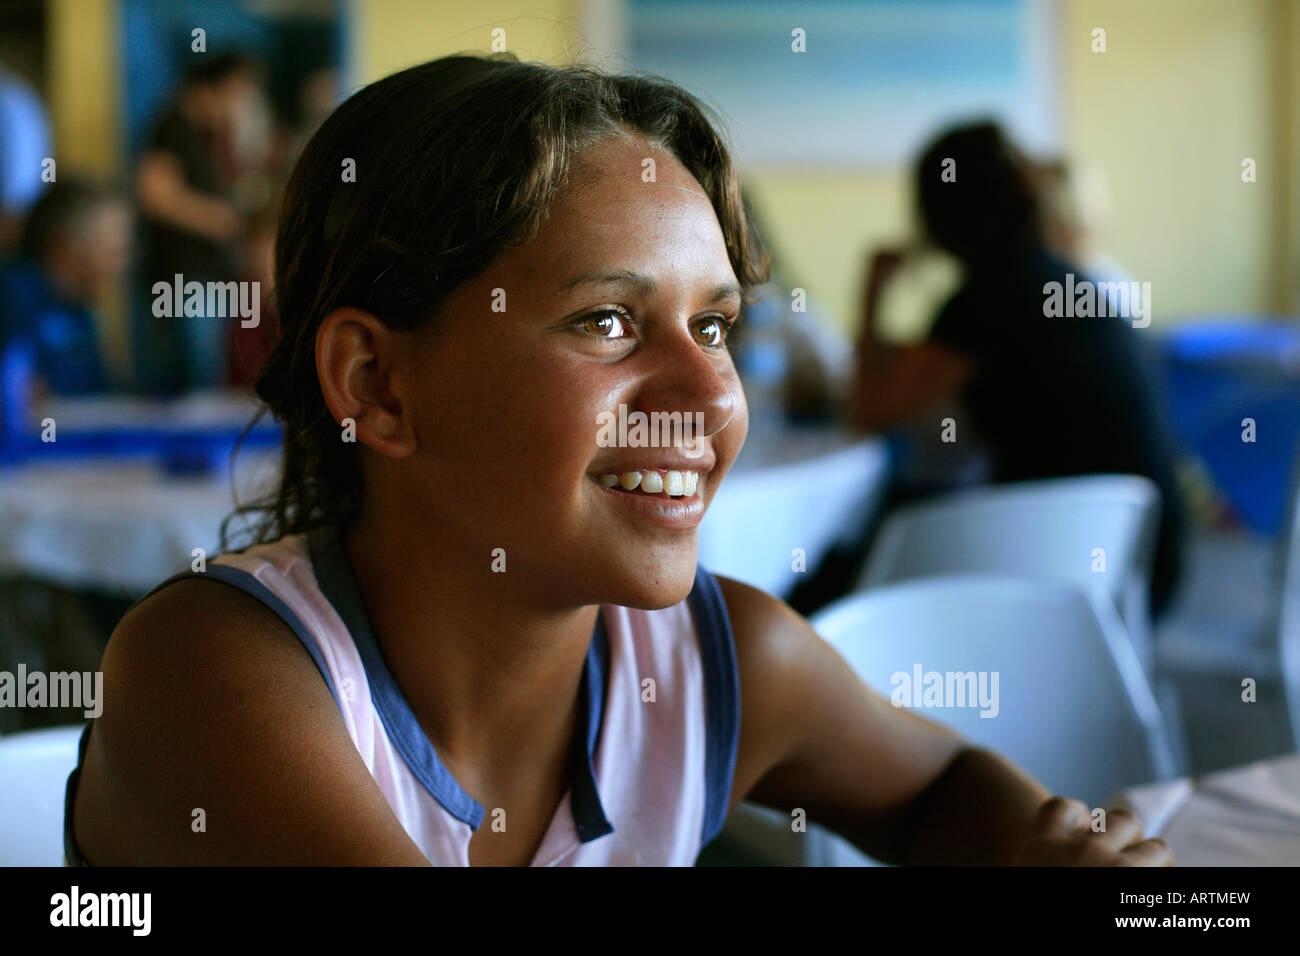 Smiling Australian aboriginal schoolgirl - Stock Image